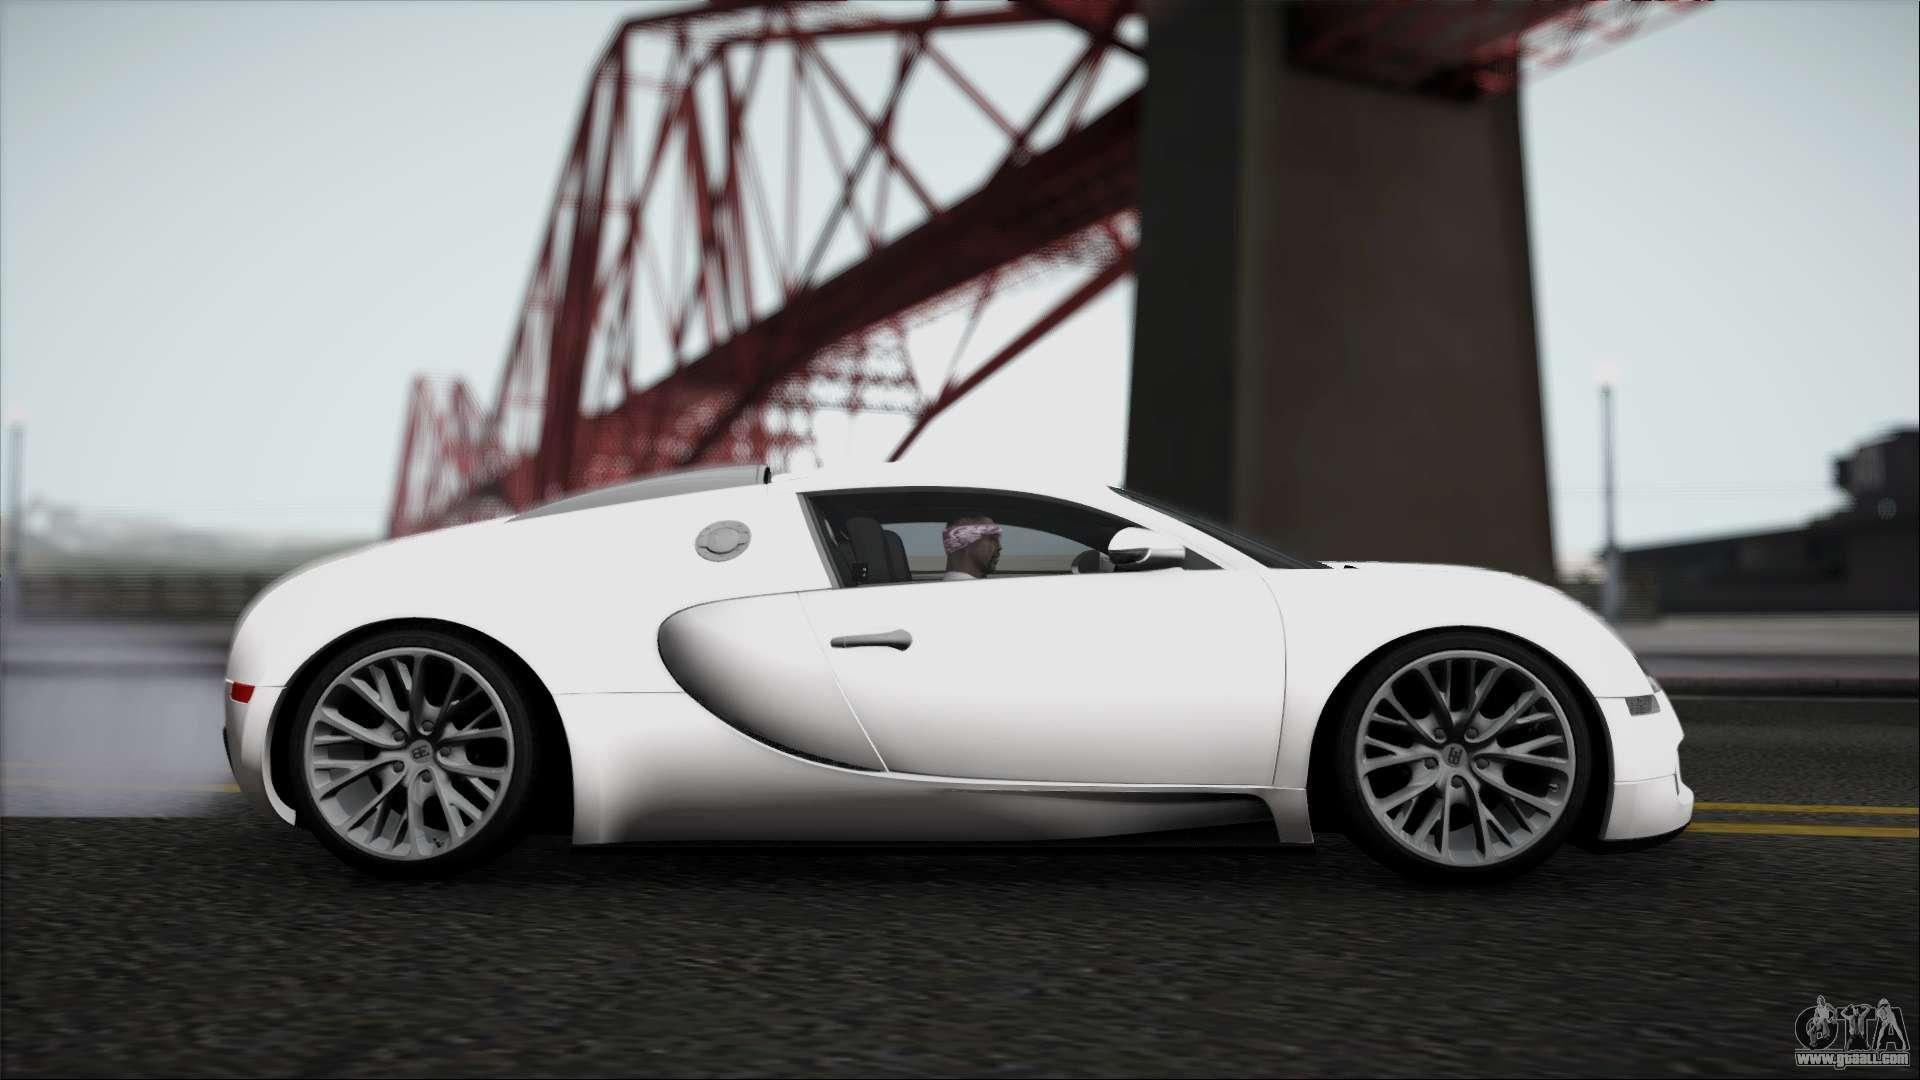 204134-proxy-sa-2014-08-06-02-13-45-660 Terrific Bugatti Veyron Mod Gta Sa Cars Trend